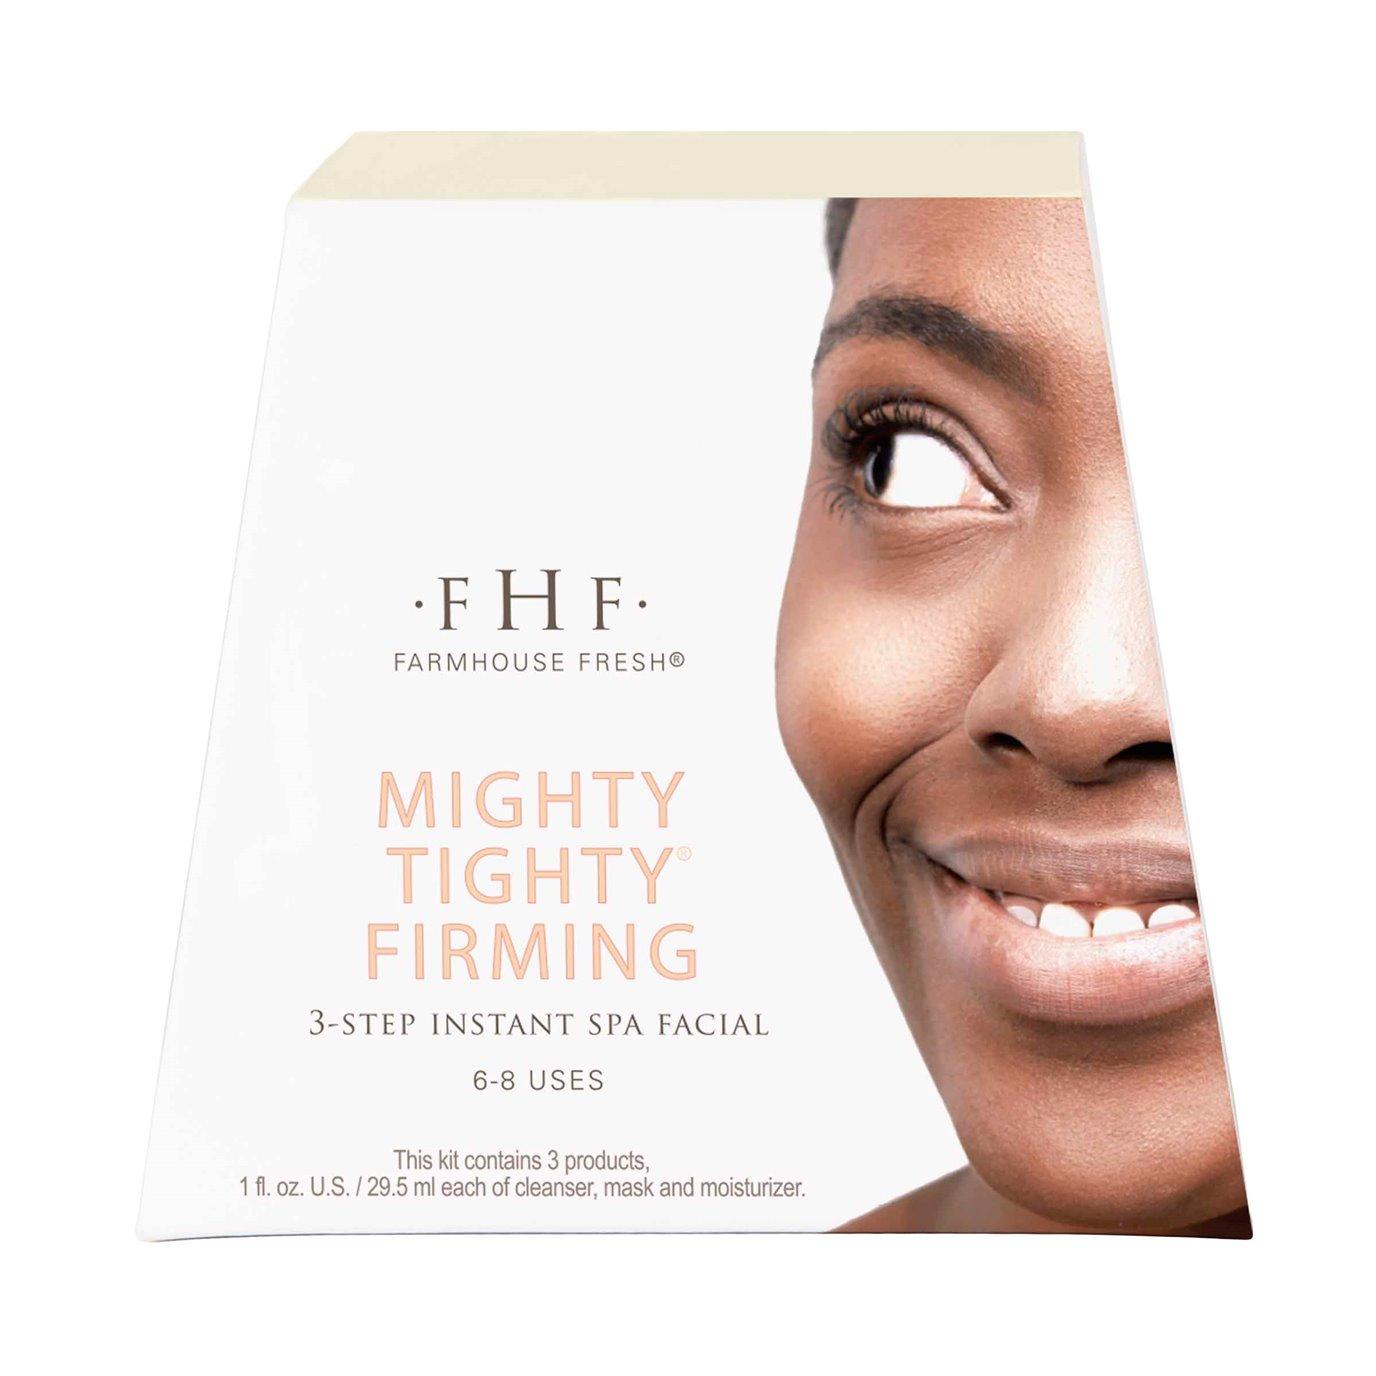 Farmhouse Fresh Mighty Tighty Firming Instant Spa Facial Kit